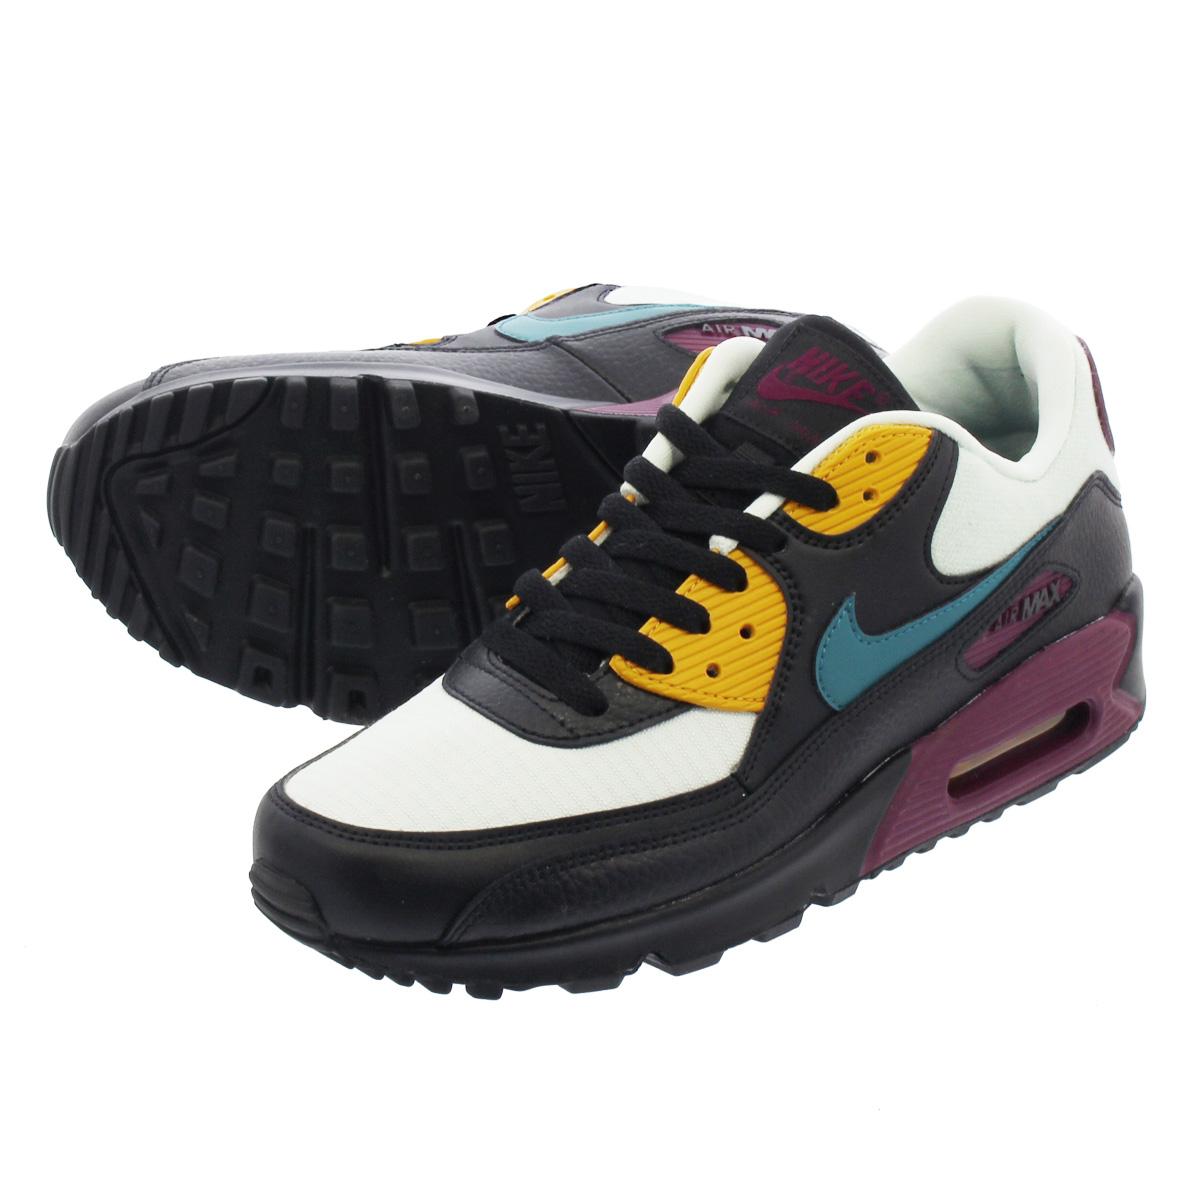 Women's Nike Air Max 90 SILVER GEODE TEAL BORDEAUX PURPLE